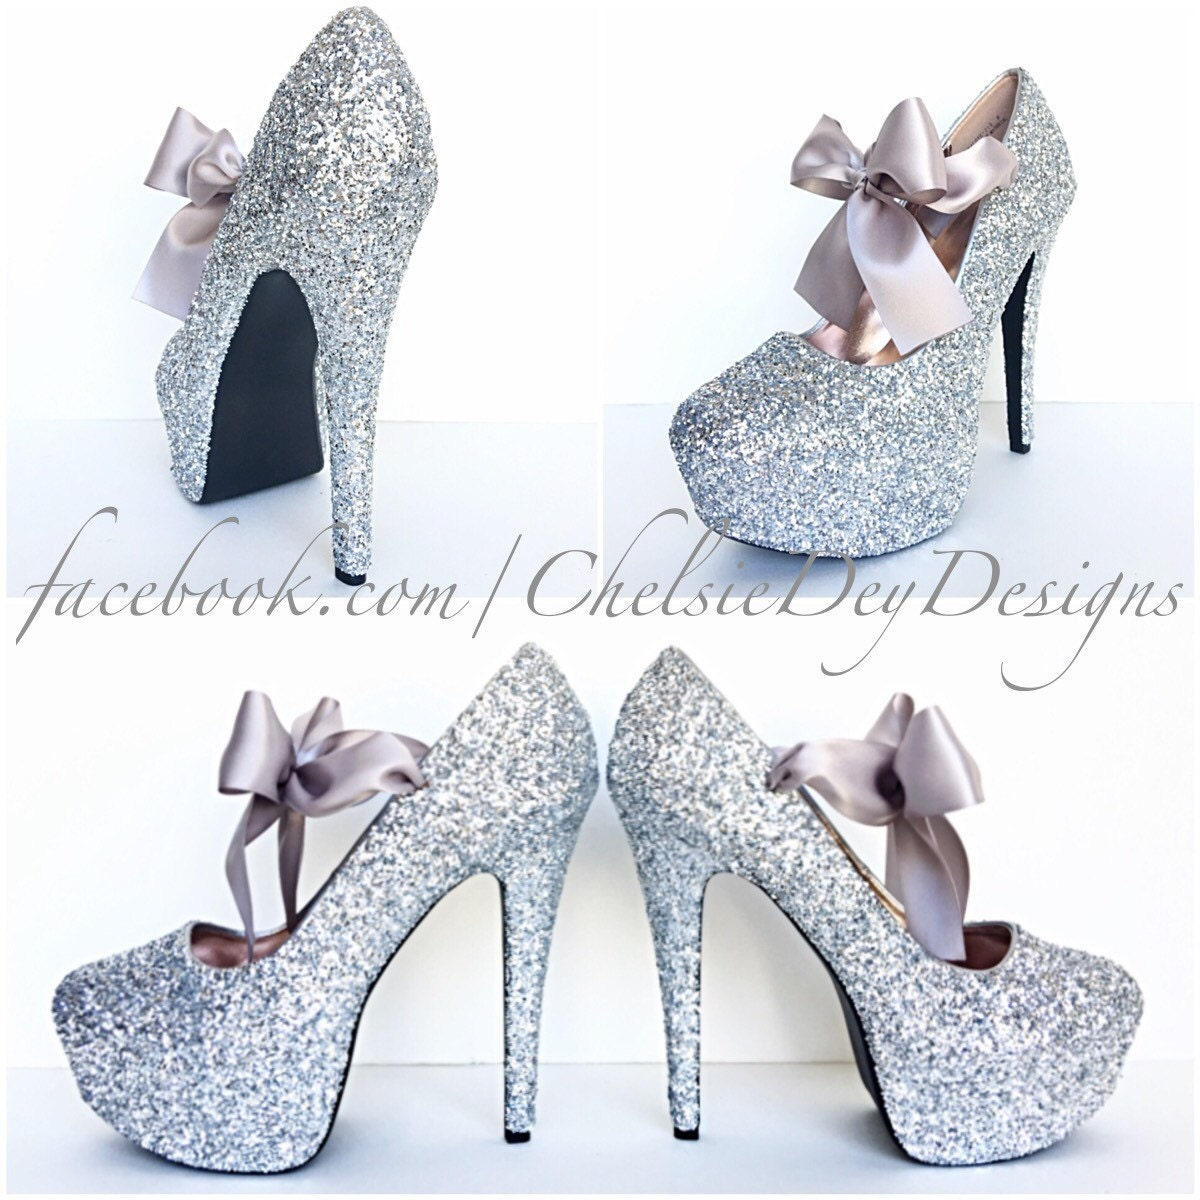 silver glitter high heels grey gray pumps prom heels. Black Bedroom Furniture Sets. Home Design Ideas